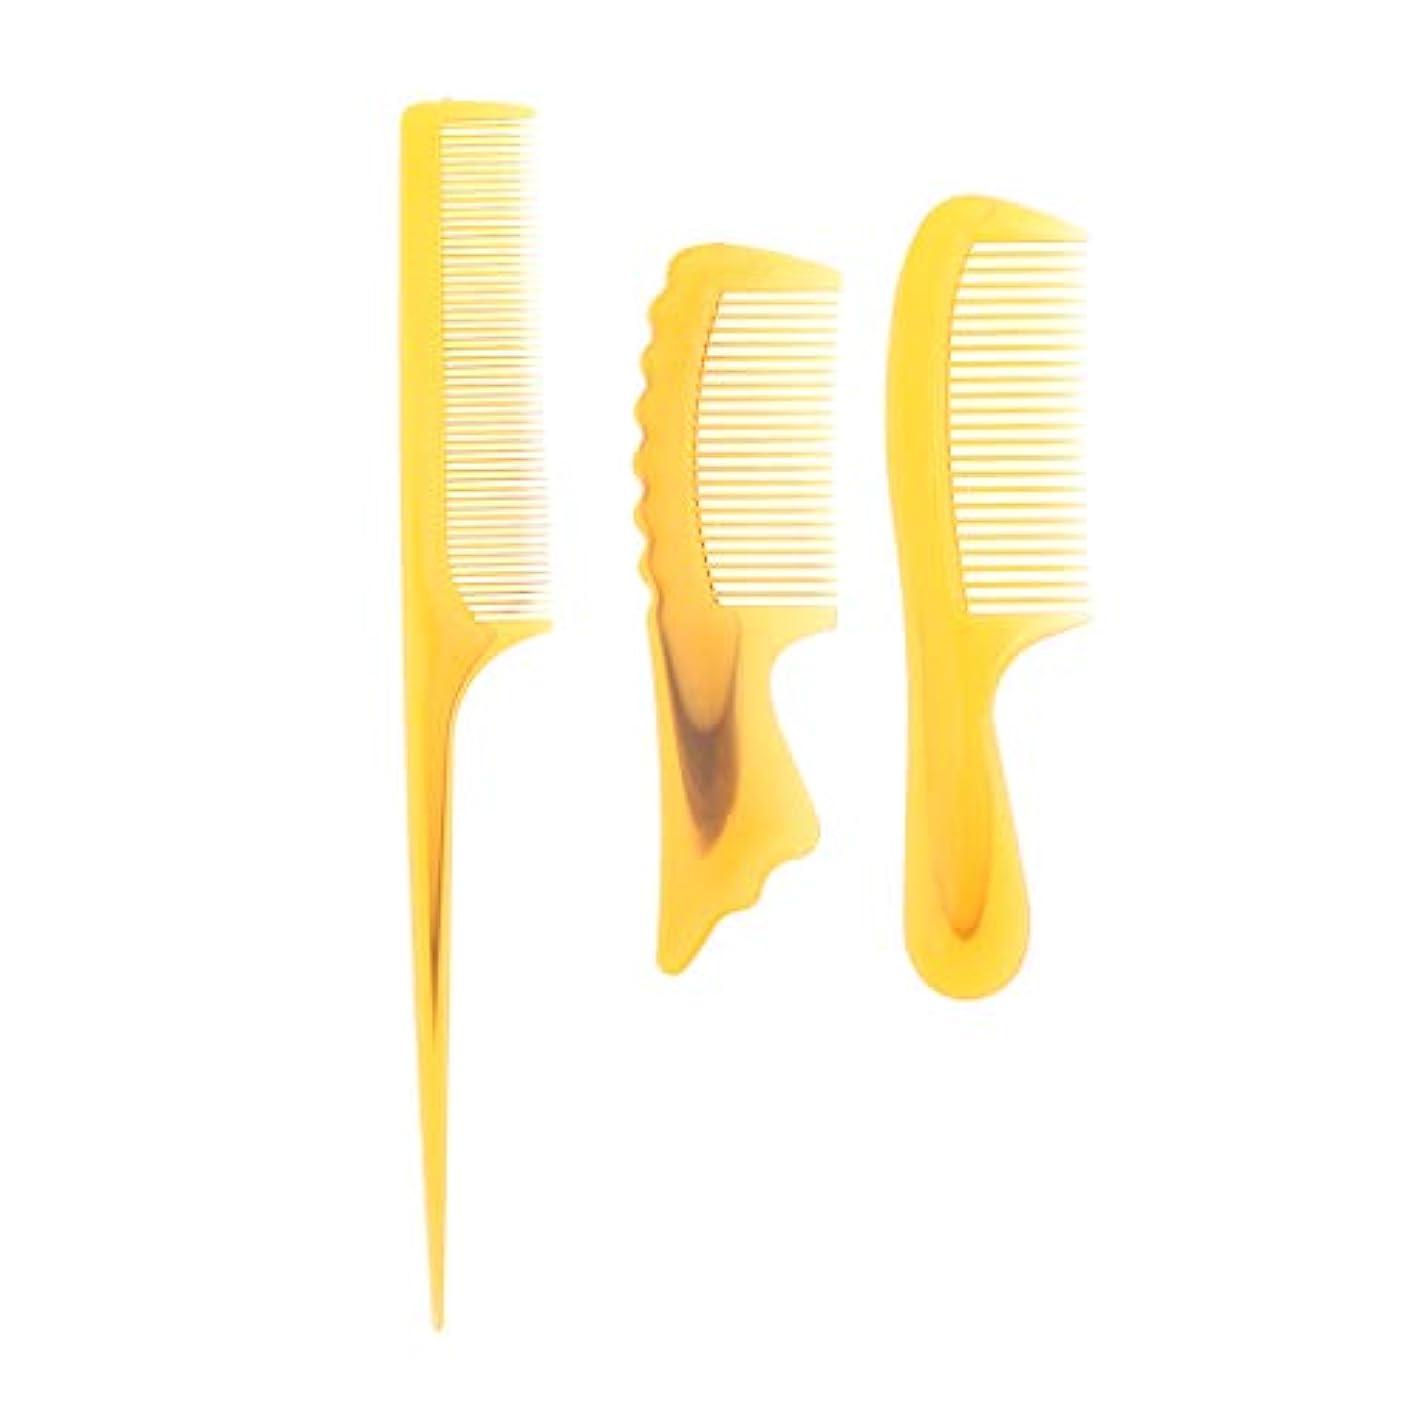 F Fityle 3個 髪の櫛 静電防止櫛 ヘアブラシ ヘアコーム コーム